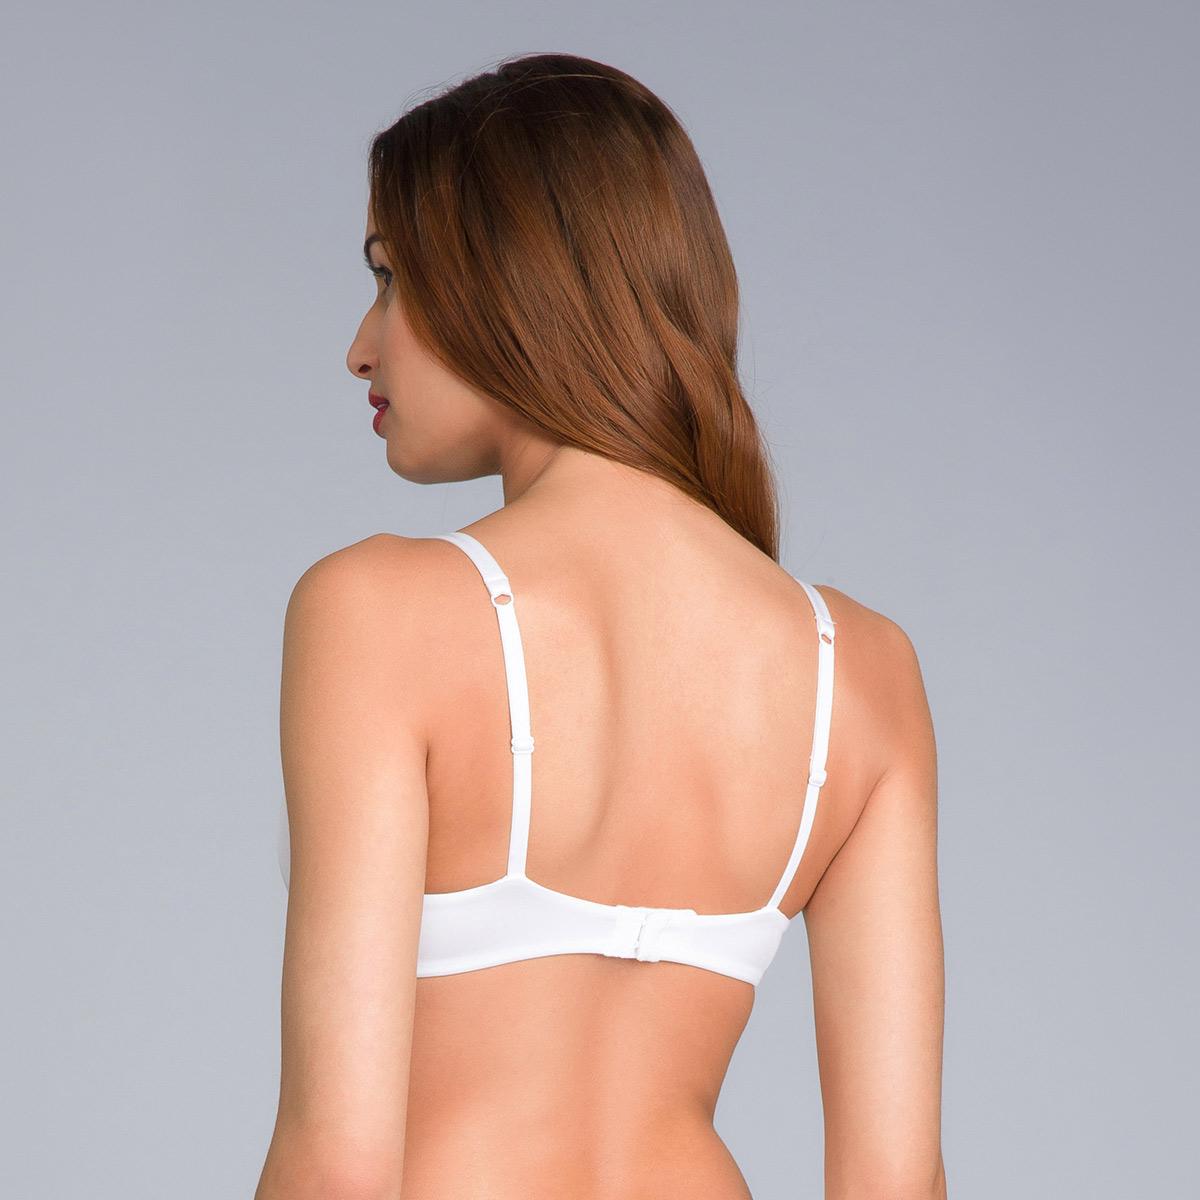 White Bra - amovible wires -  – 24H Soft Absolu-PLAYTEX